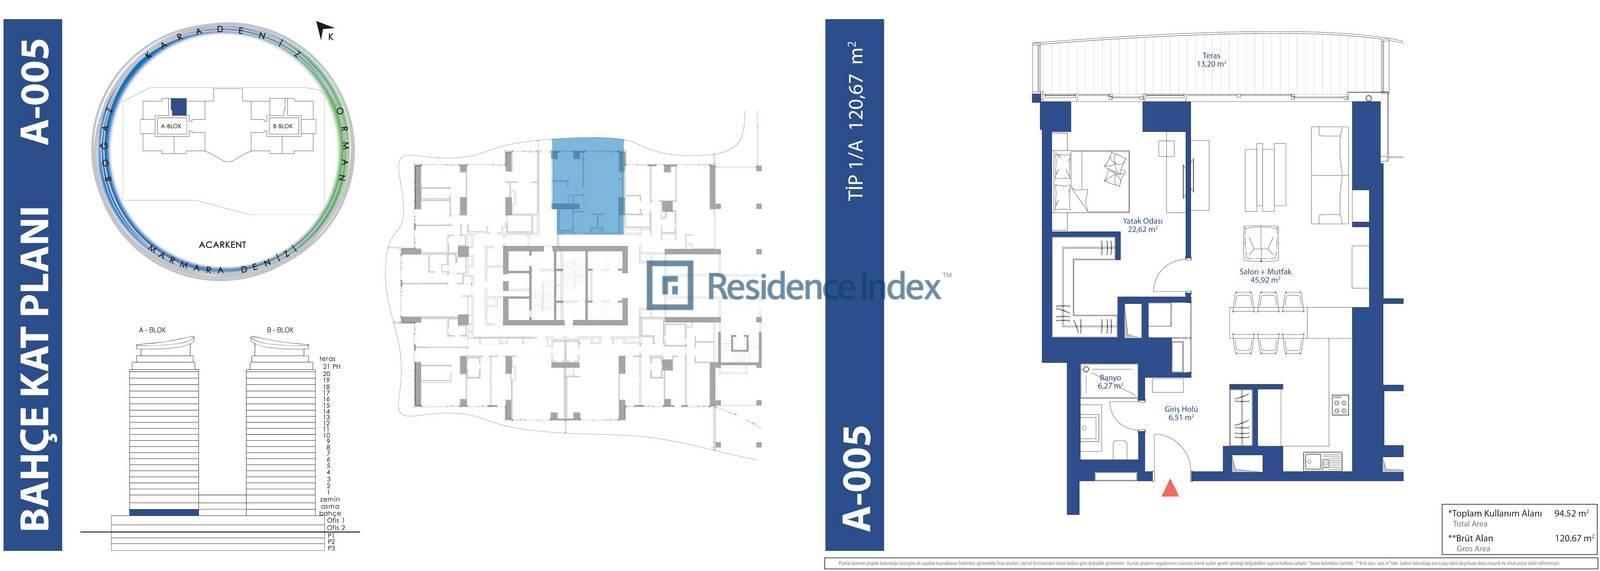 AcarBlu Residence Tip 1A